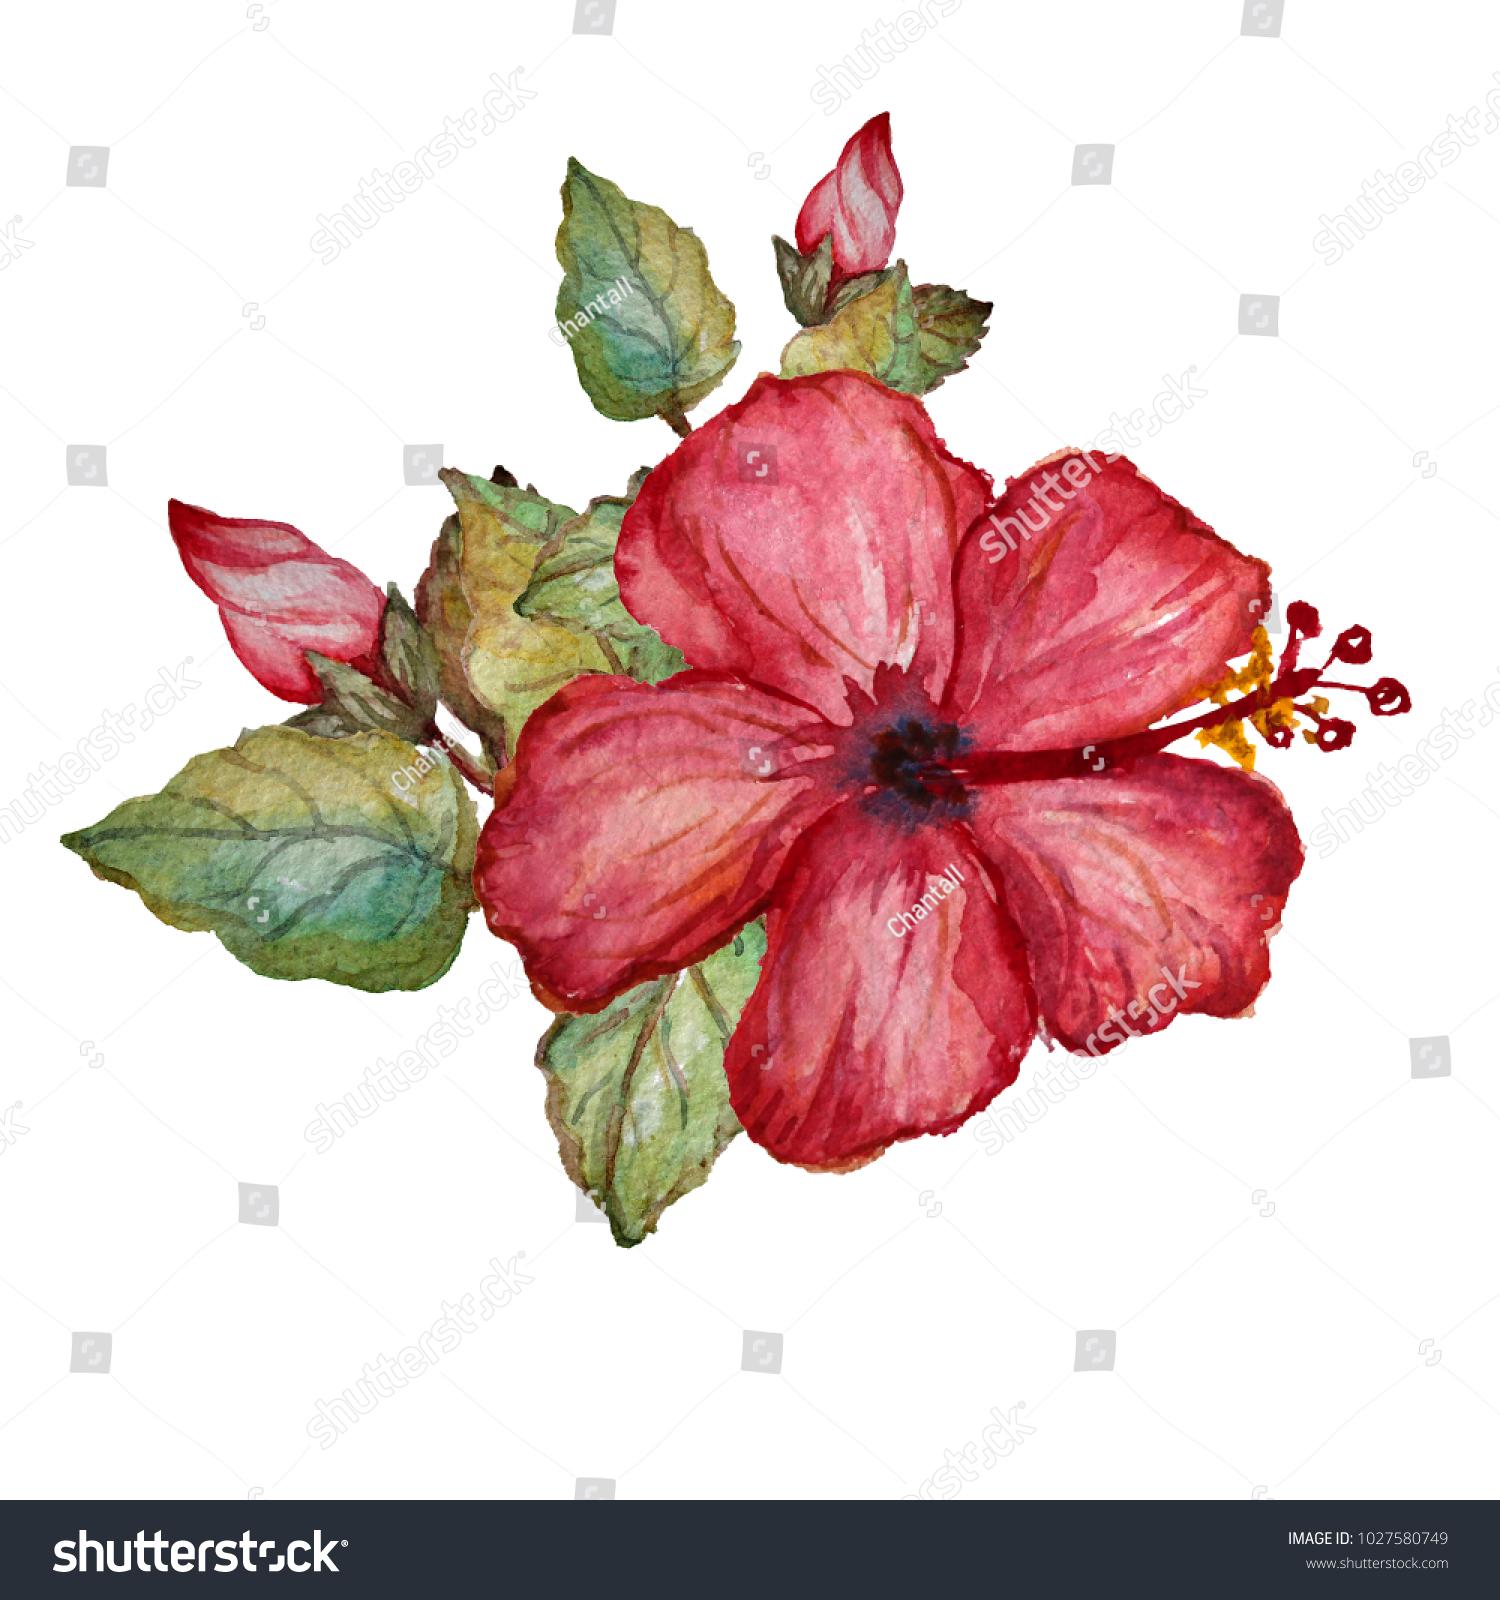 Decorative Watercolor Hibiscus Flowers Clipart Design Stock Photo